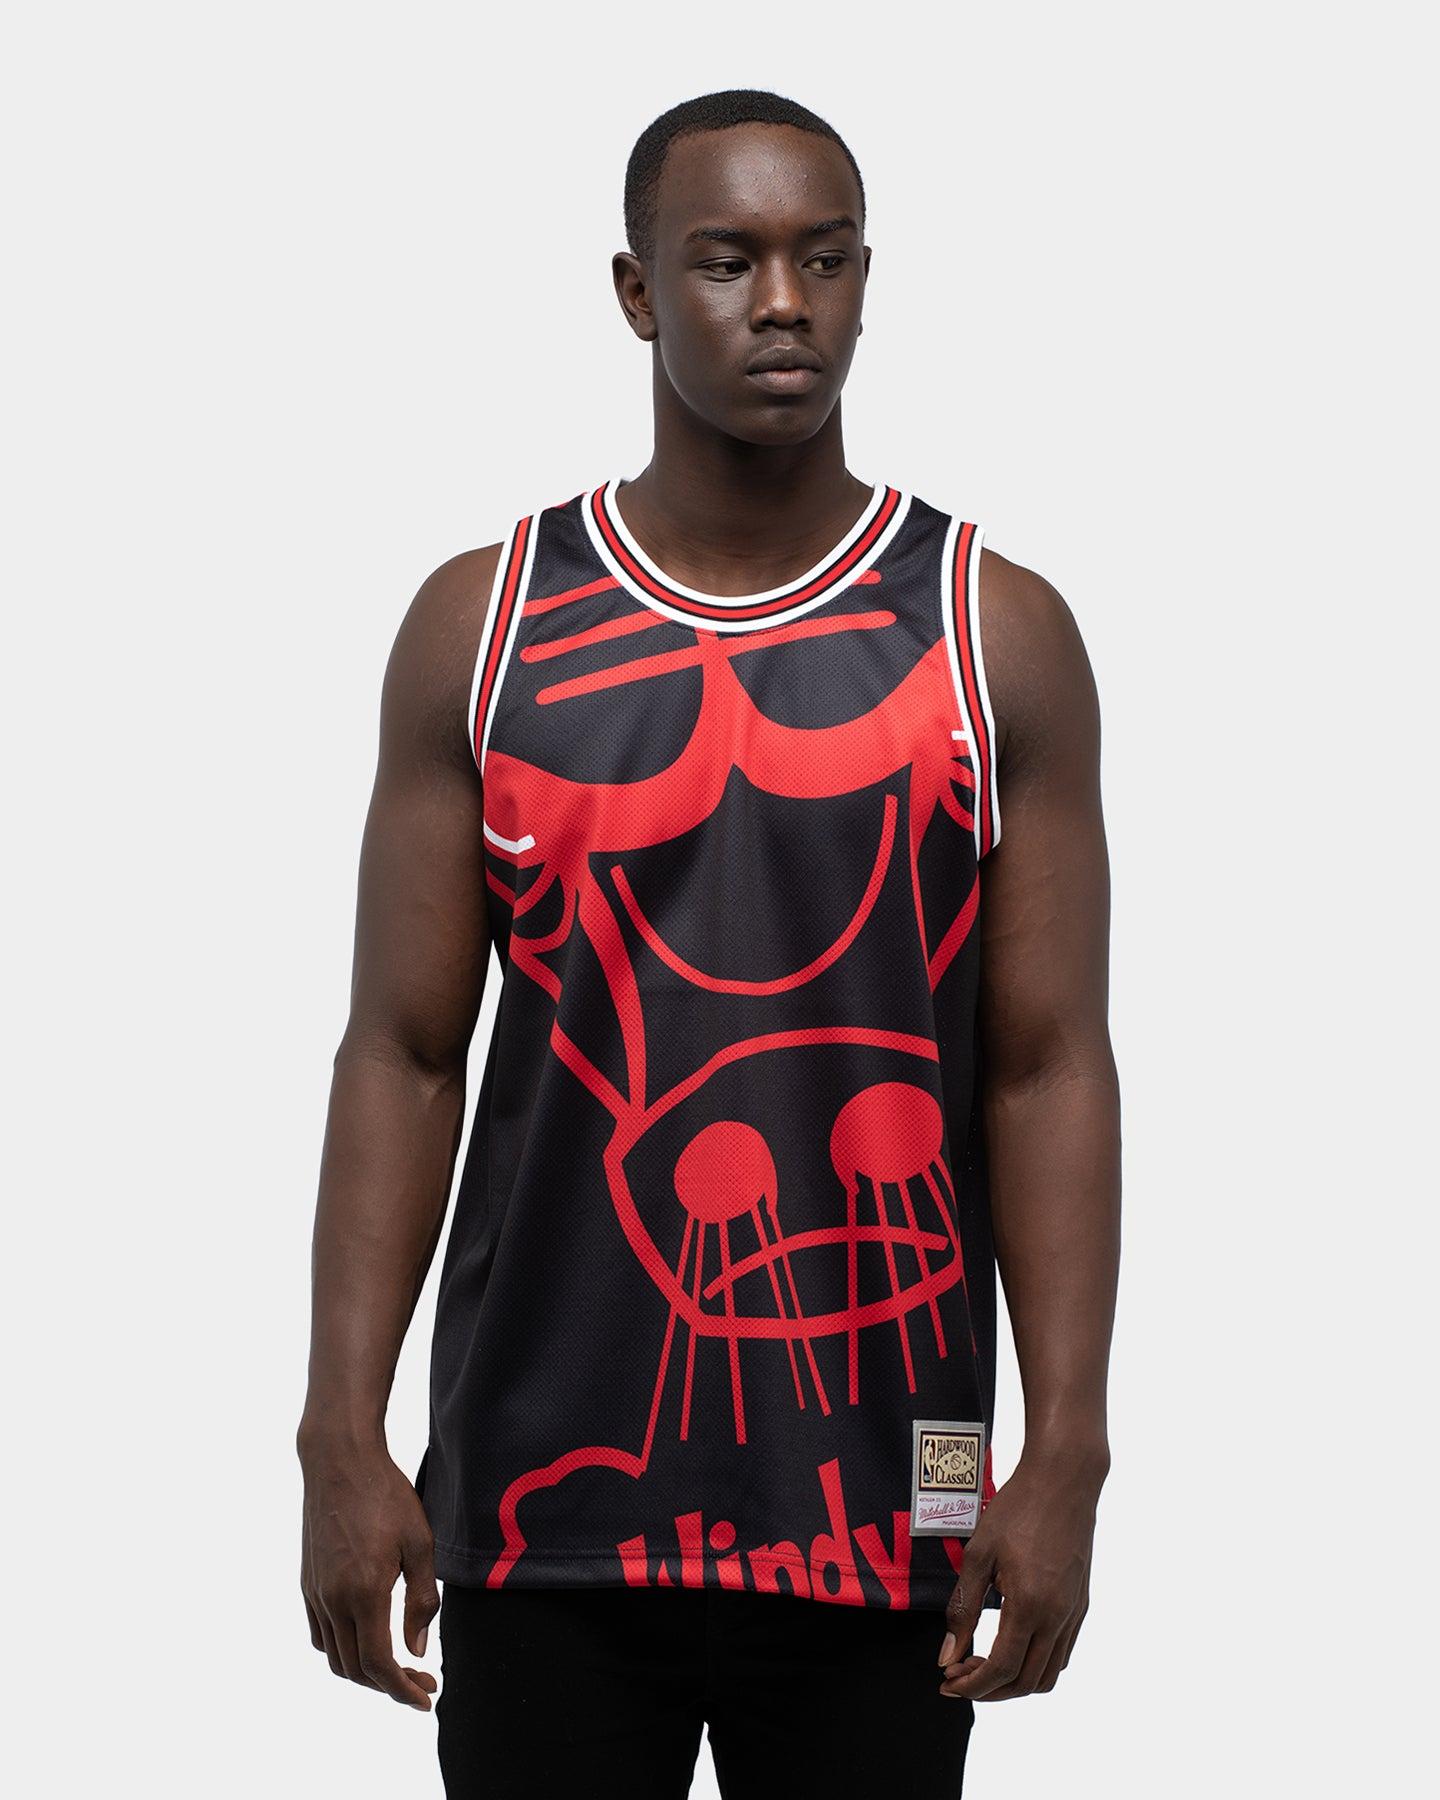 New $50 Brooklyn Nets Adidas Youth Hoodie Black Hooded Sweatshirt Boy's Kids NBA